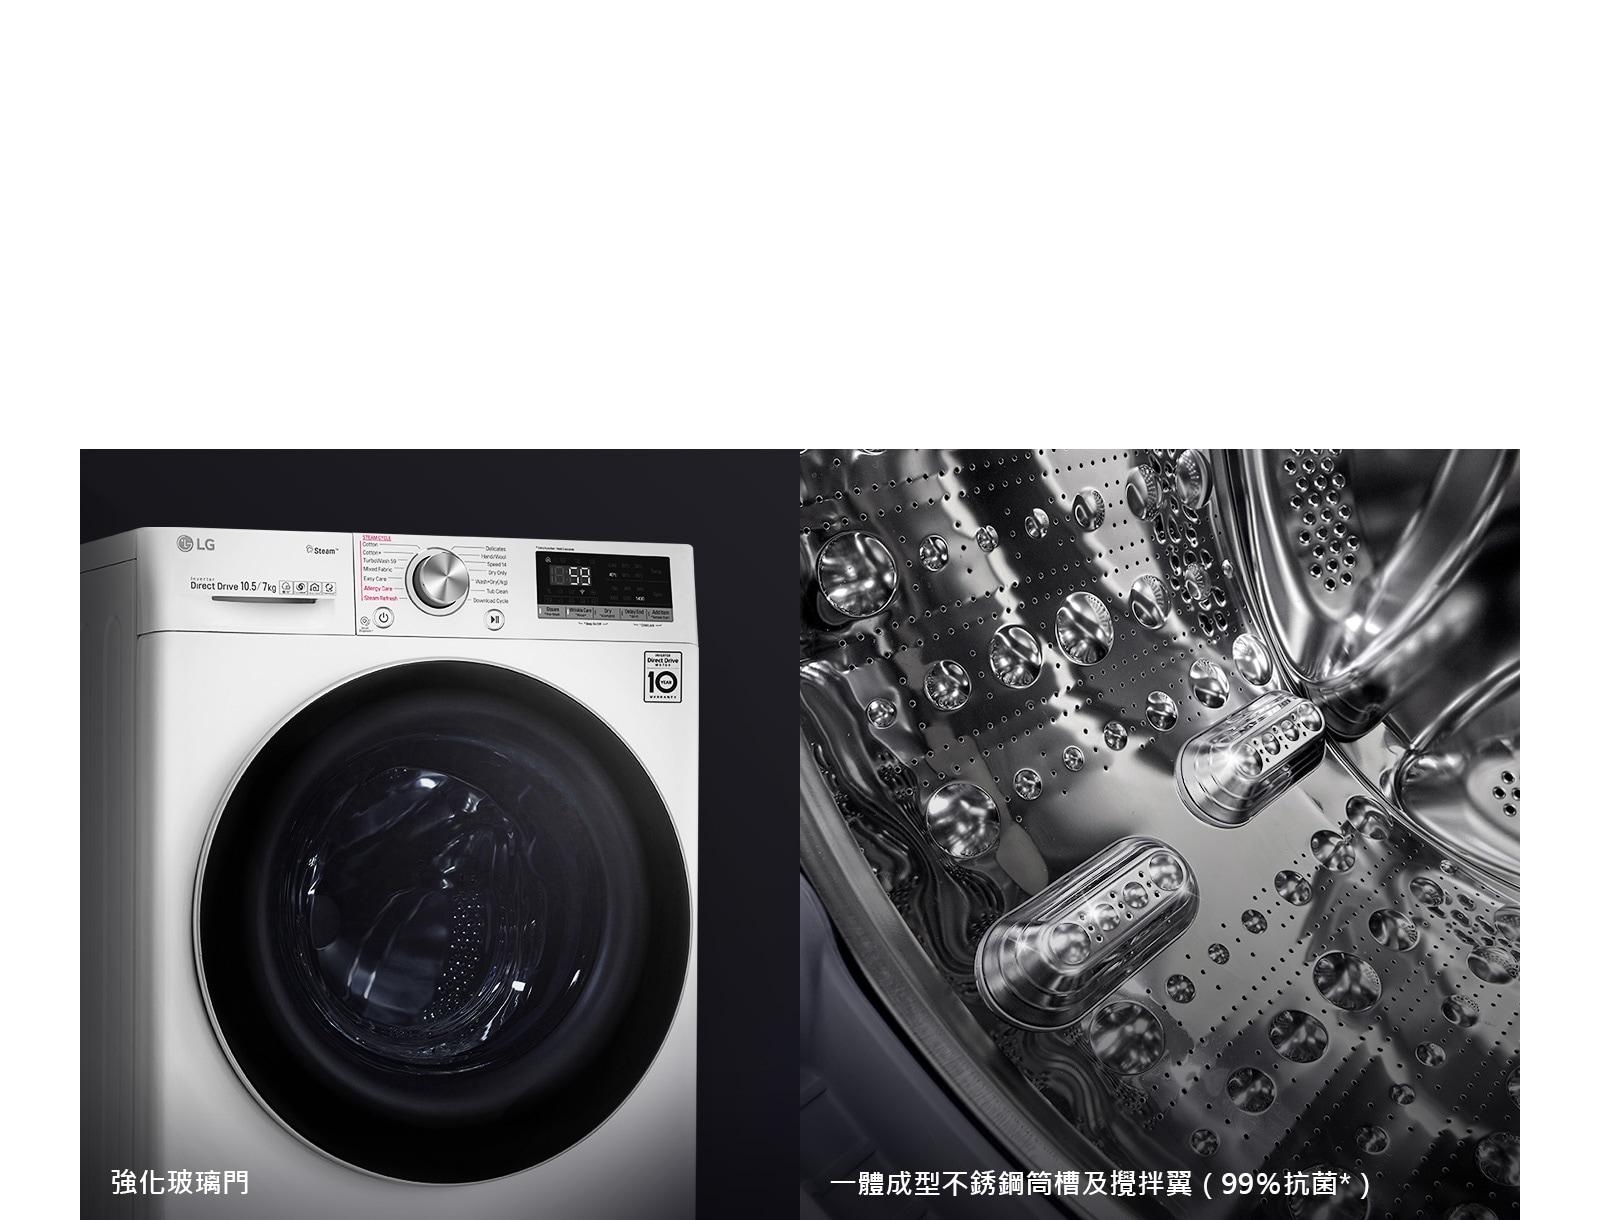 WD-Vivace-V700-VC3-White-10-1-Druability-Desktop